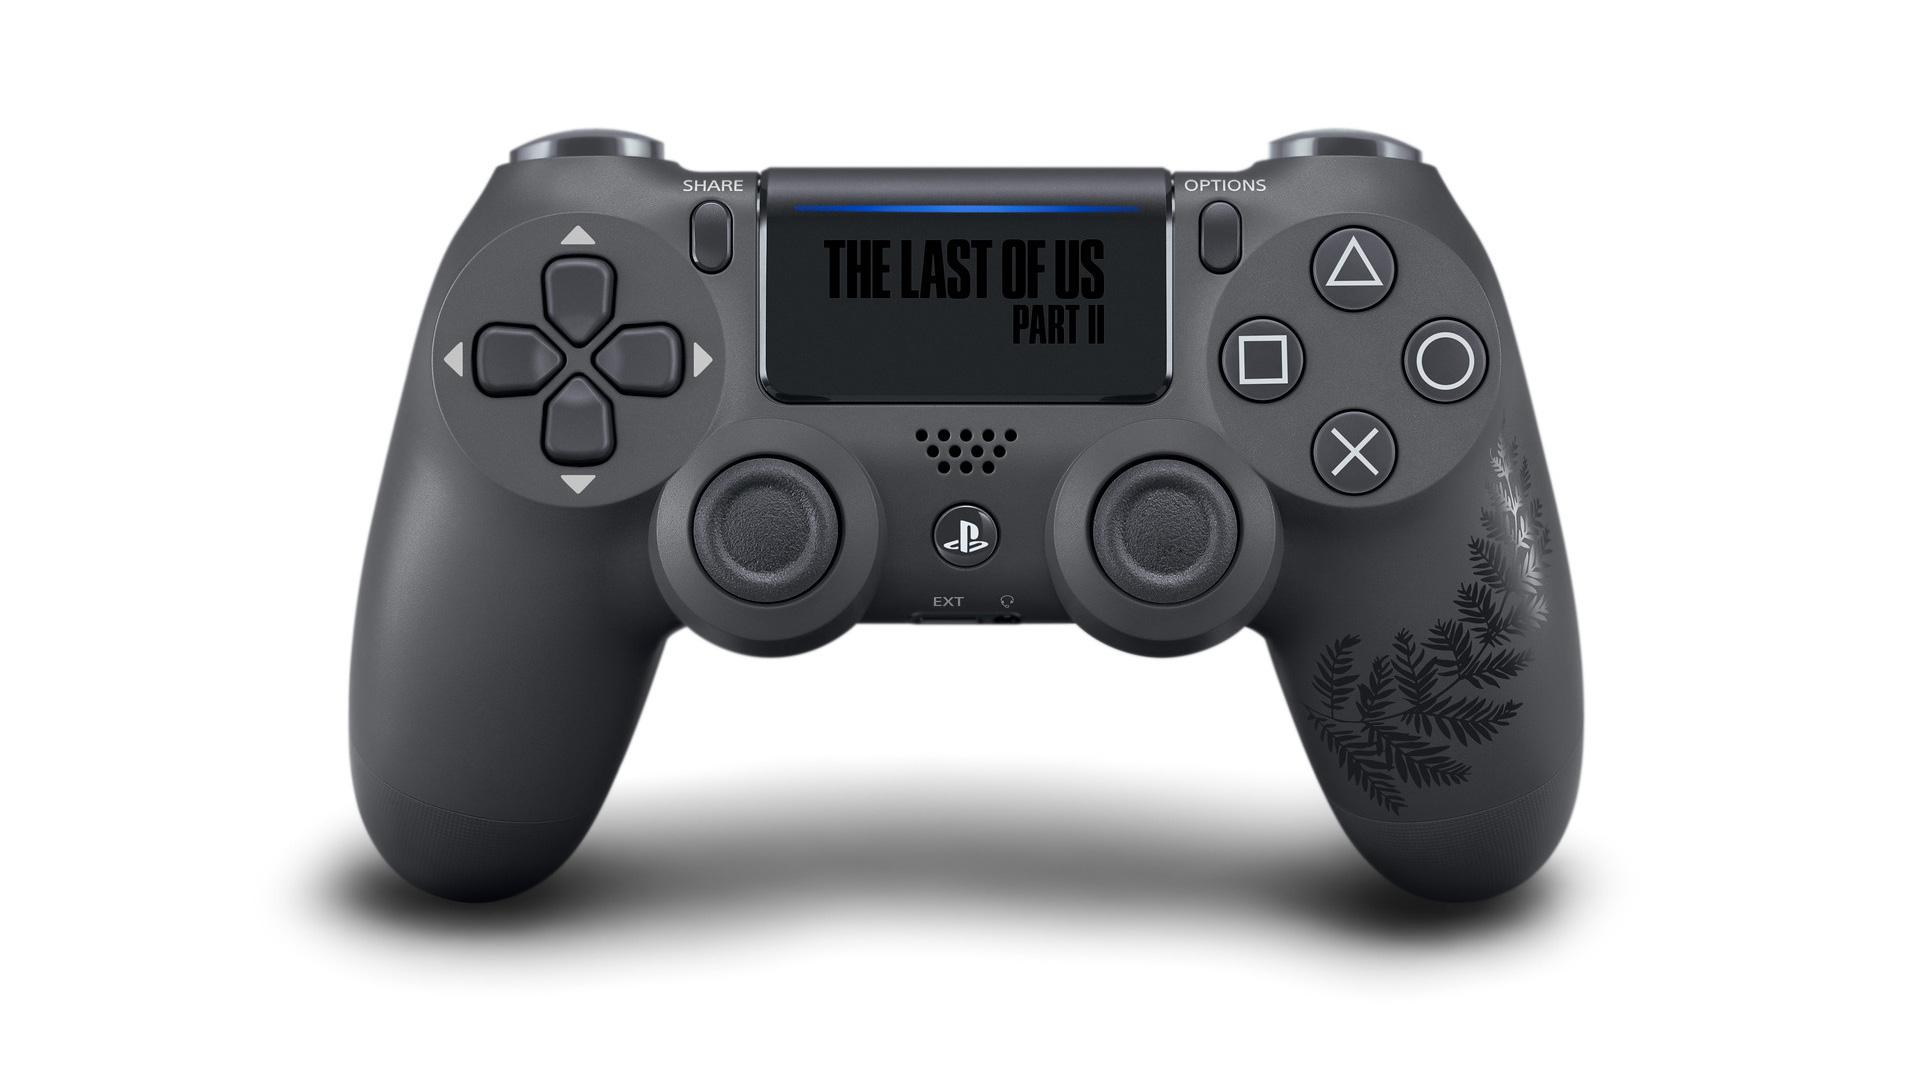 The Last of Us Part II DualShock 4